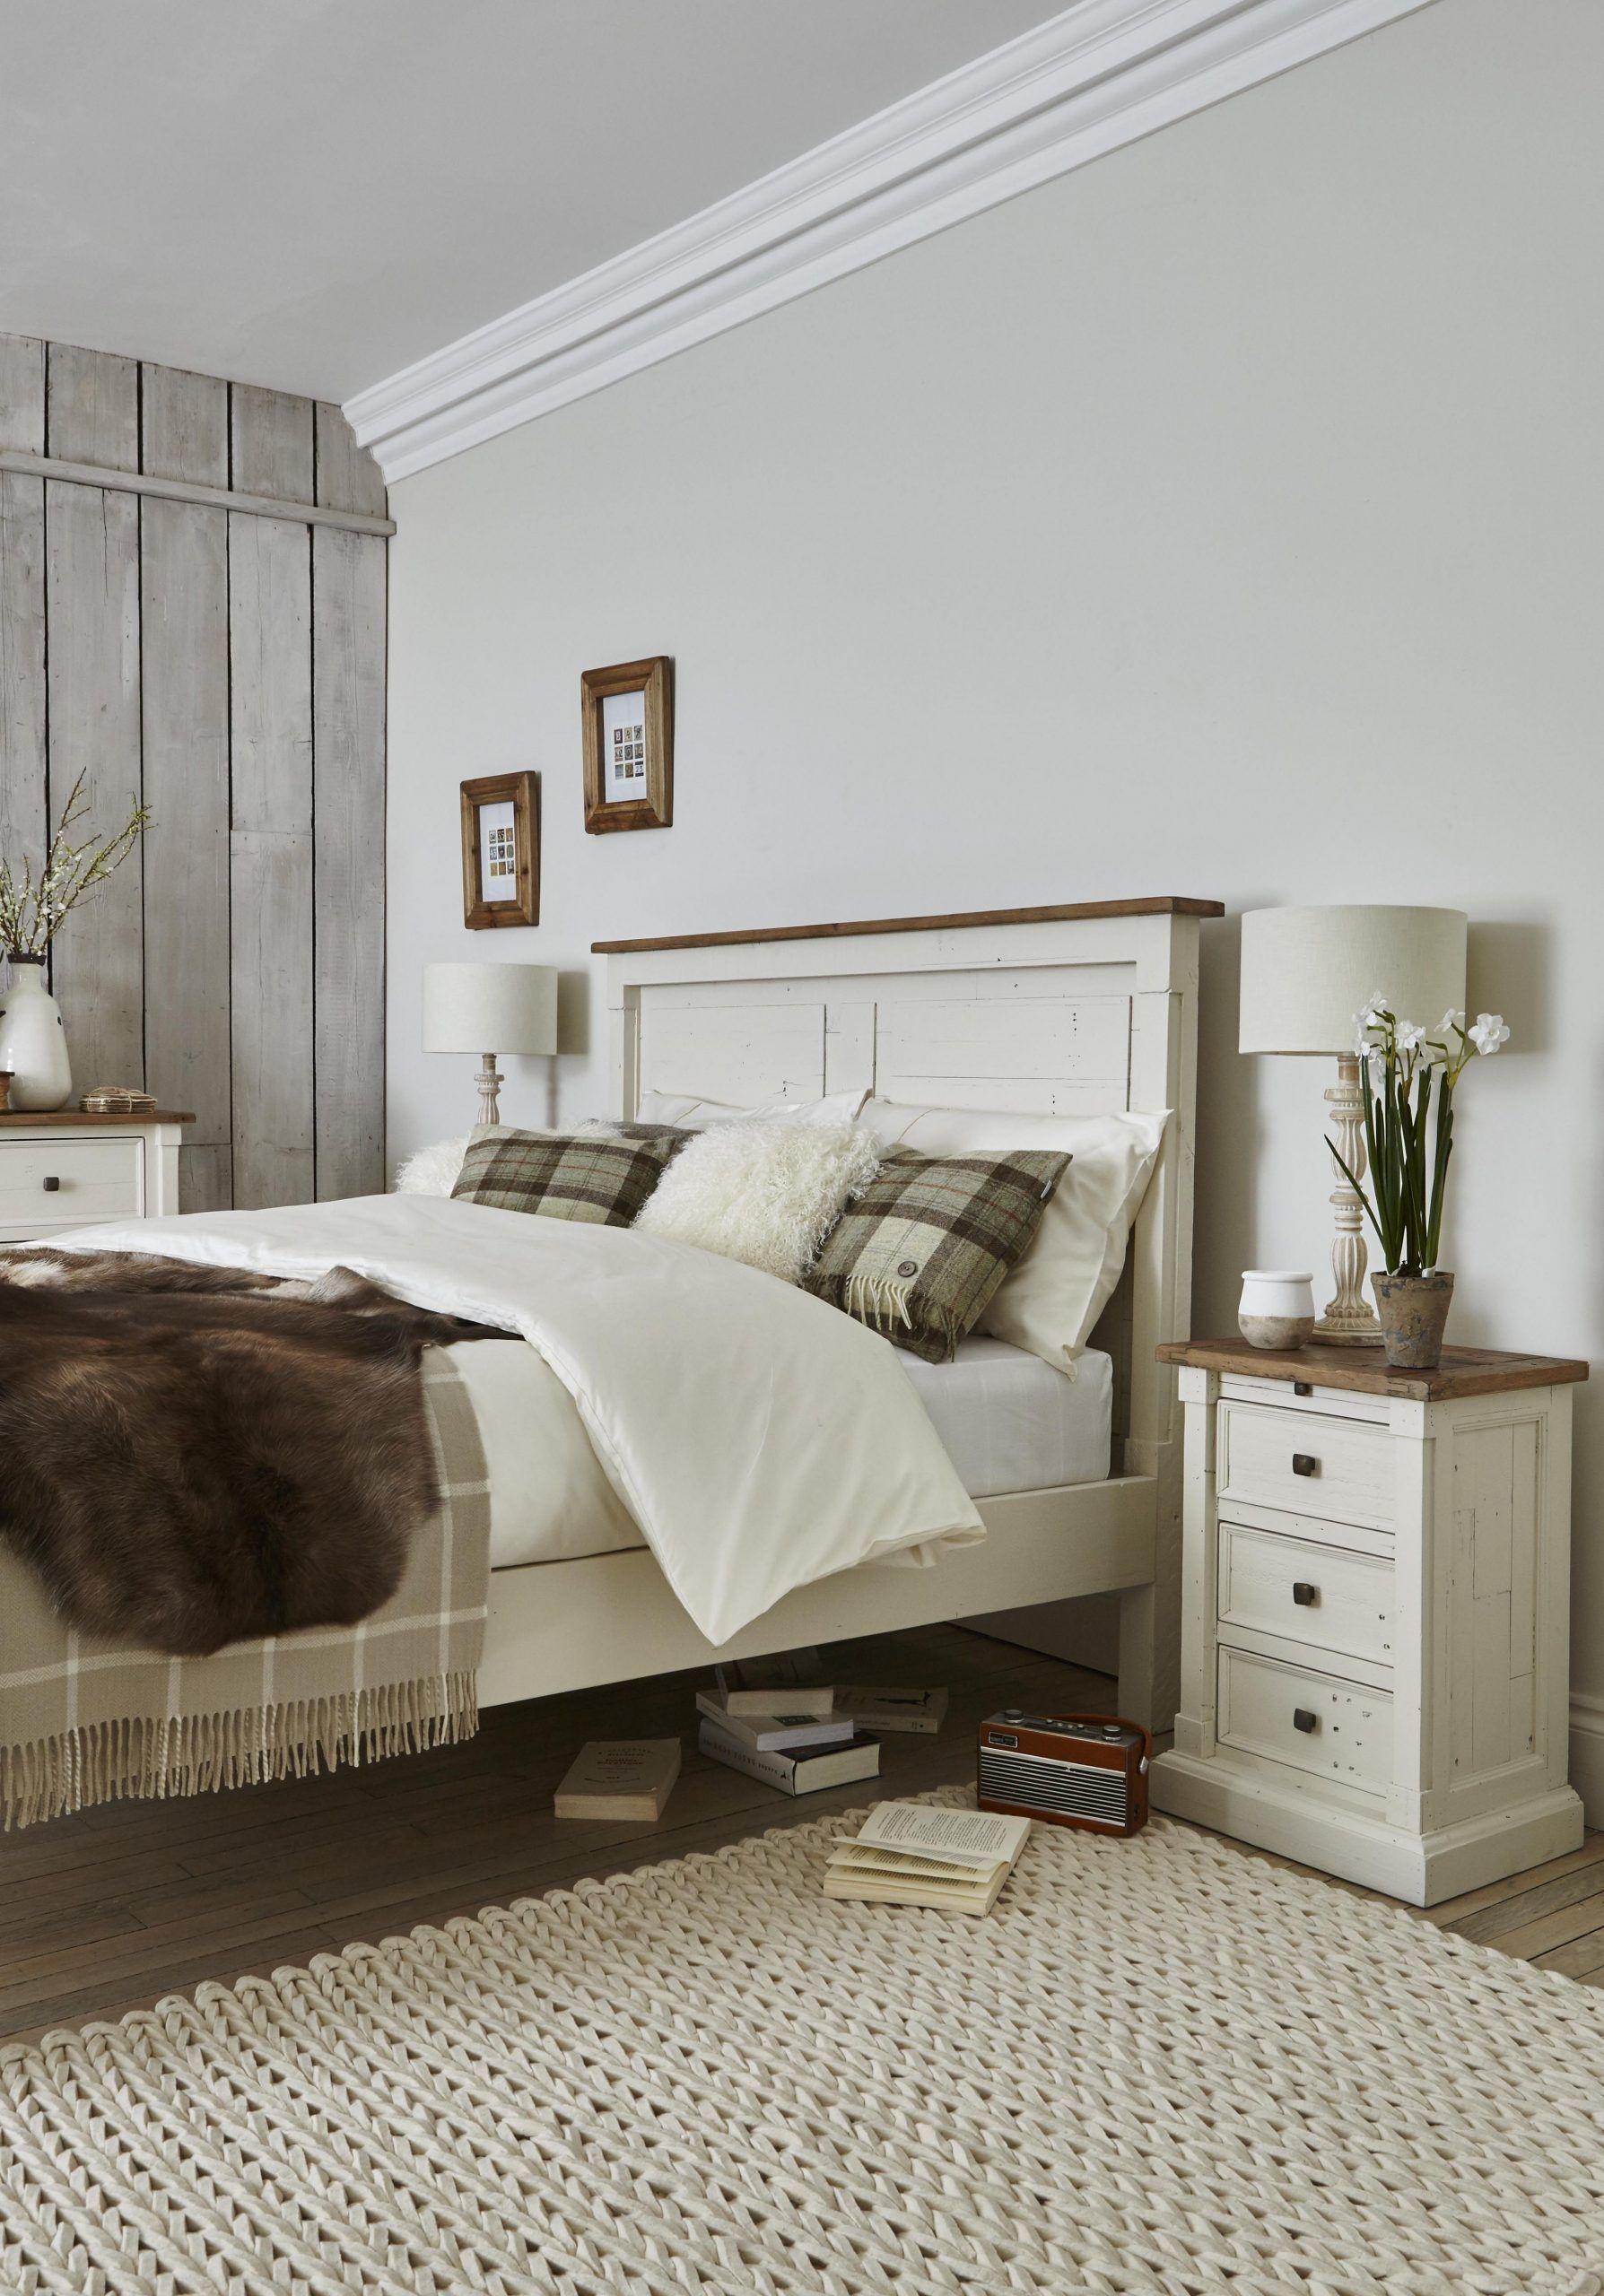 Stylish Wooden Bedroom Furniture  Furniture, Modern